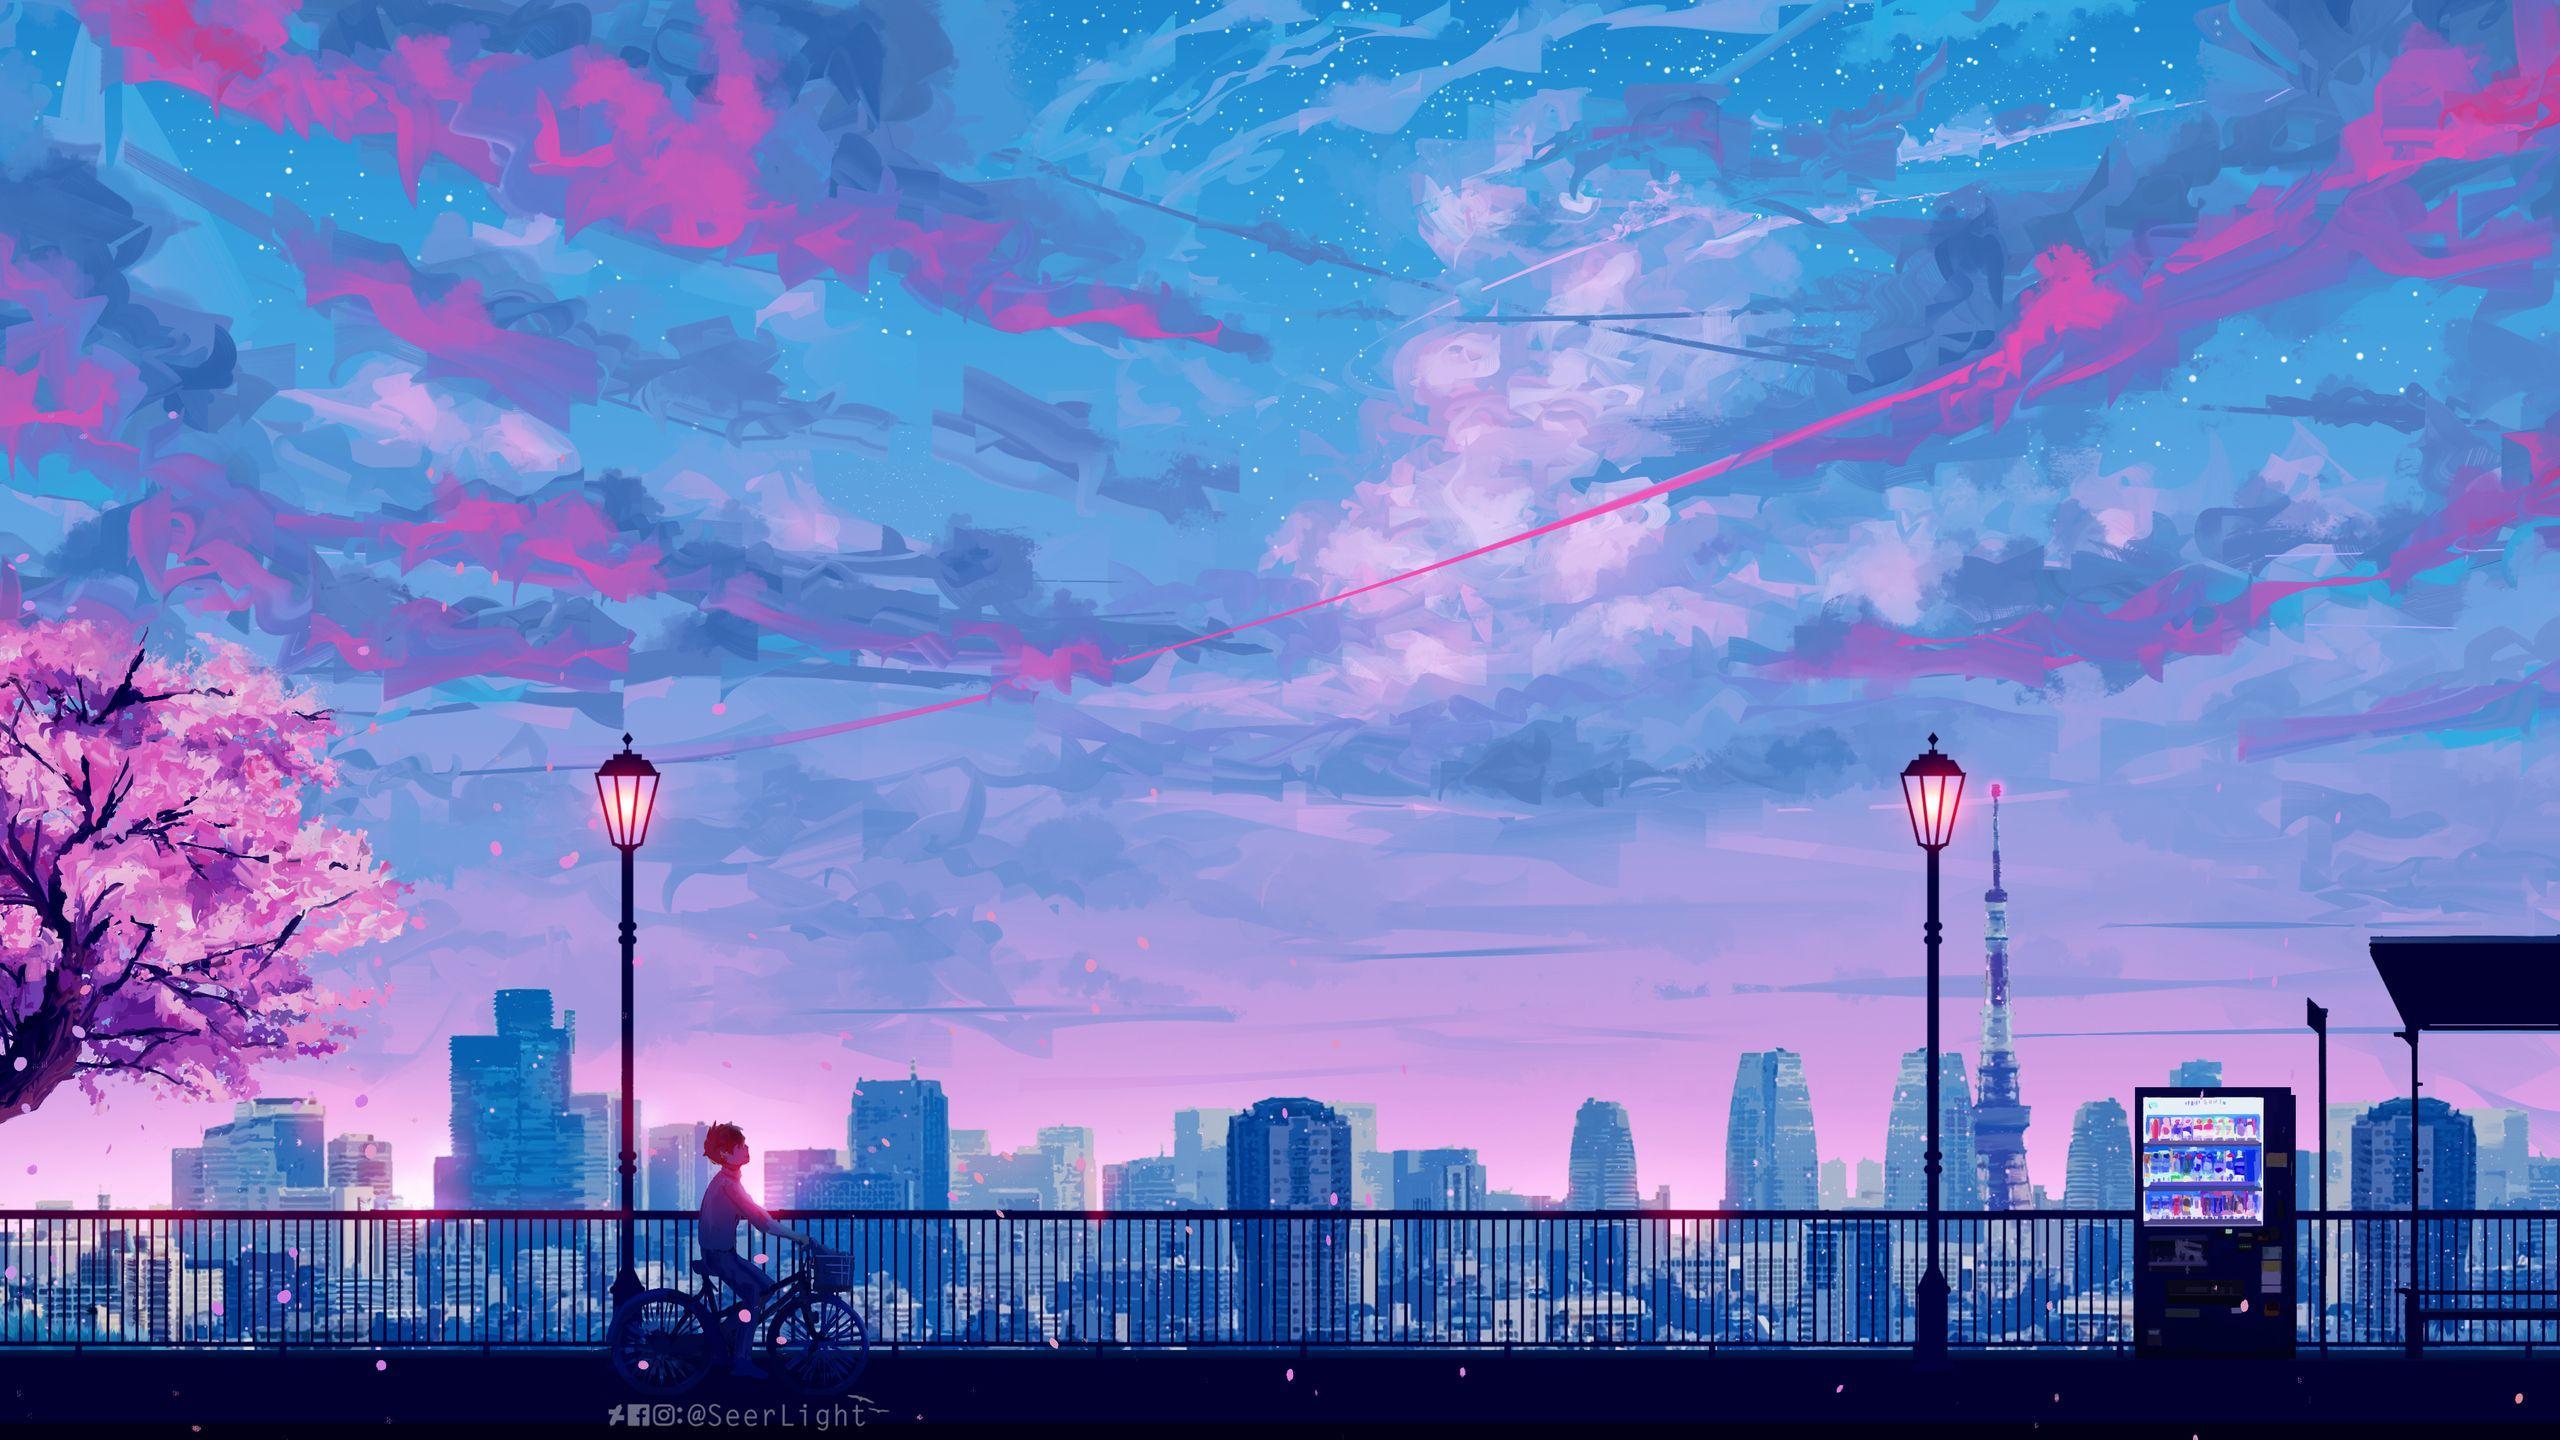 15 1440p Anime Wallpaper Orochi Wallpaper